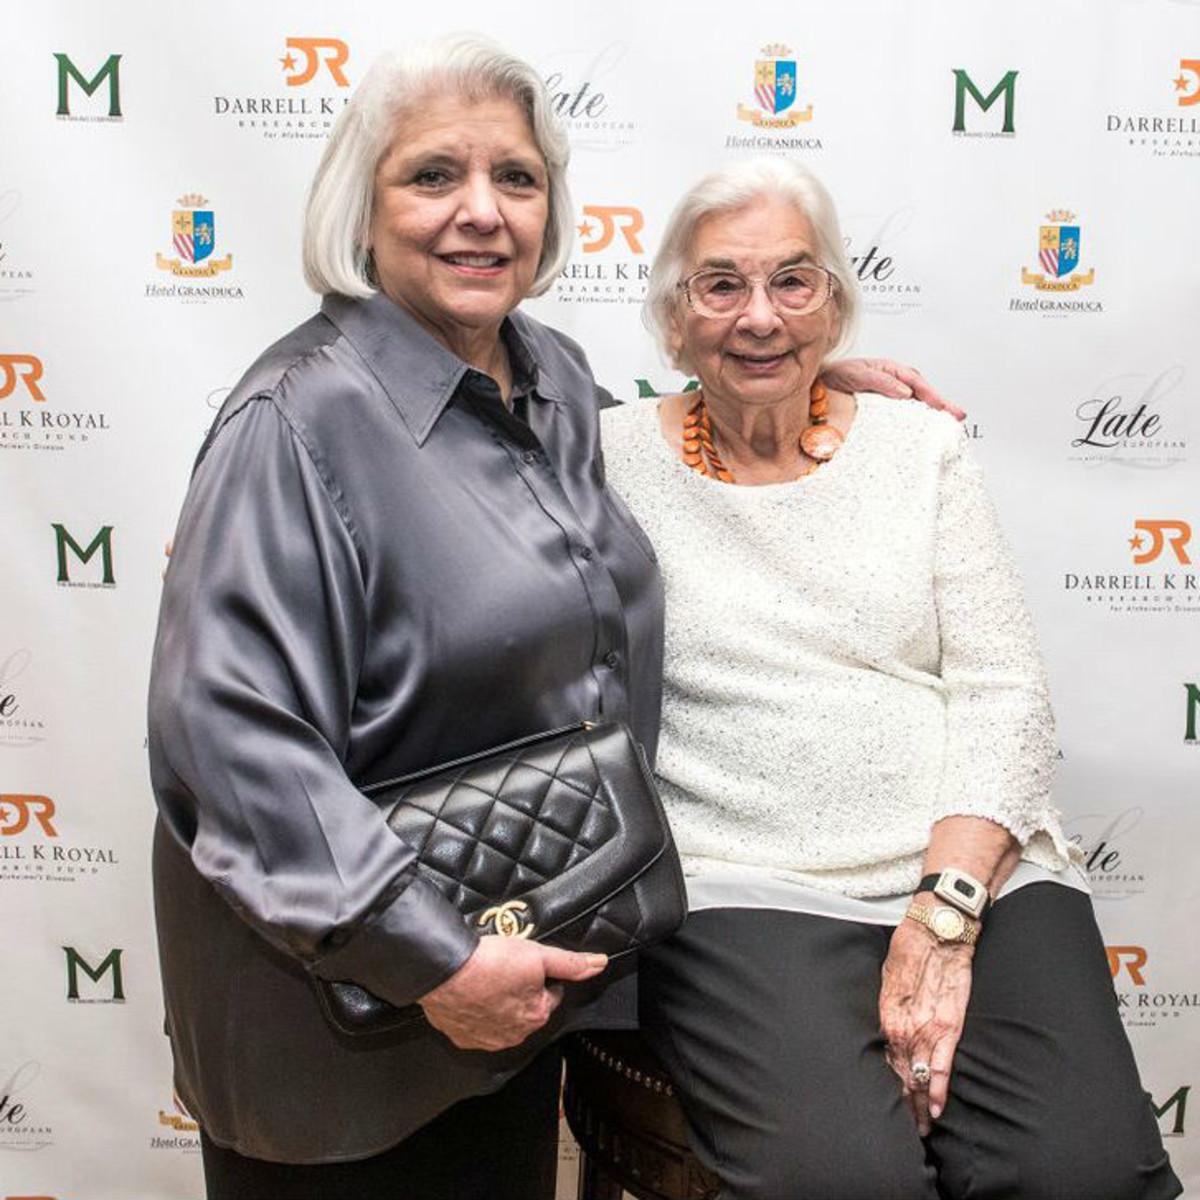 Edith Royal Senator Judith Zaffirini 90th birthday